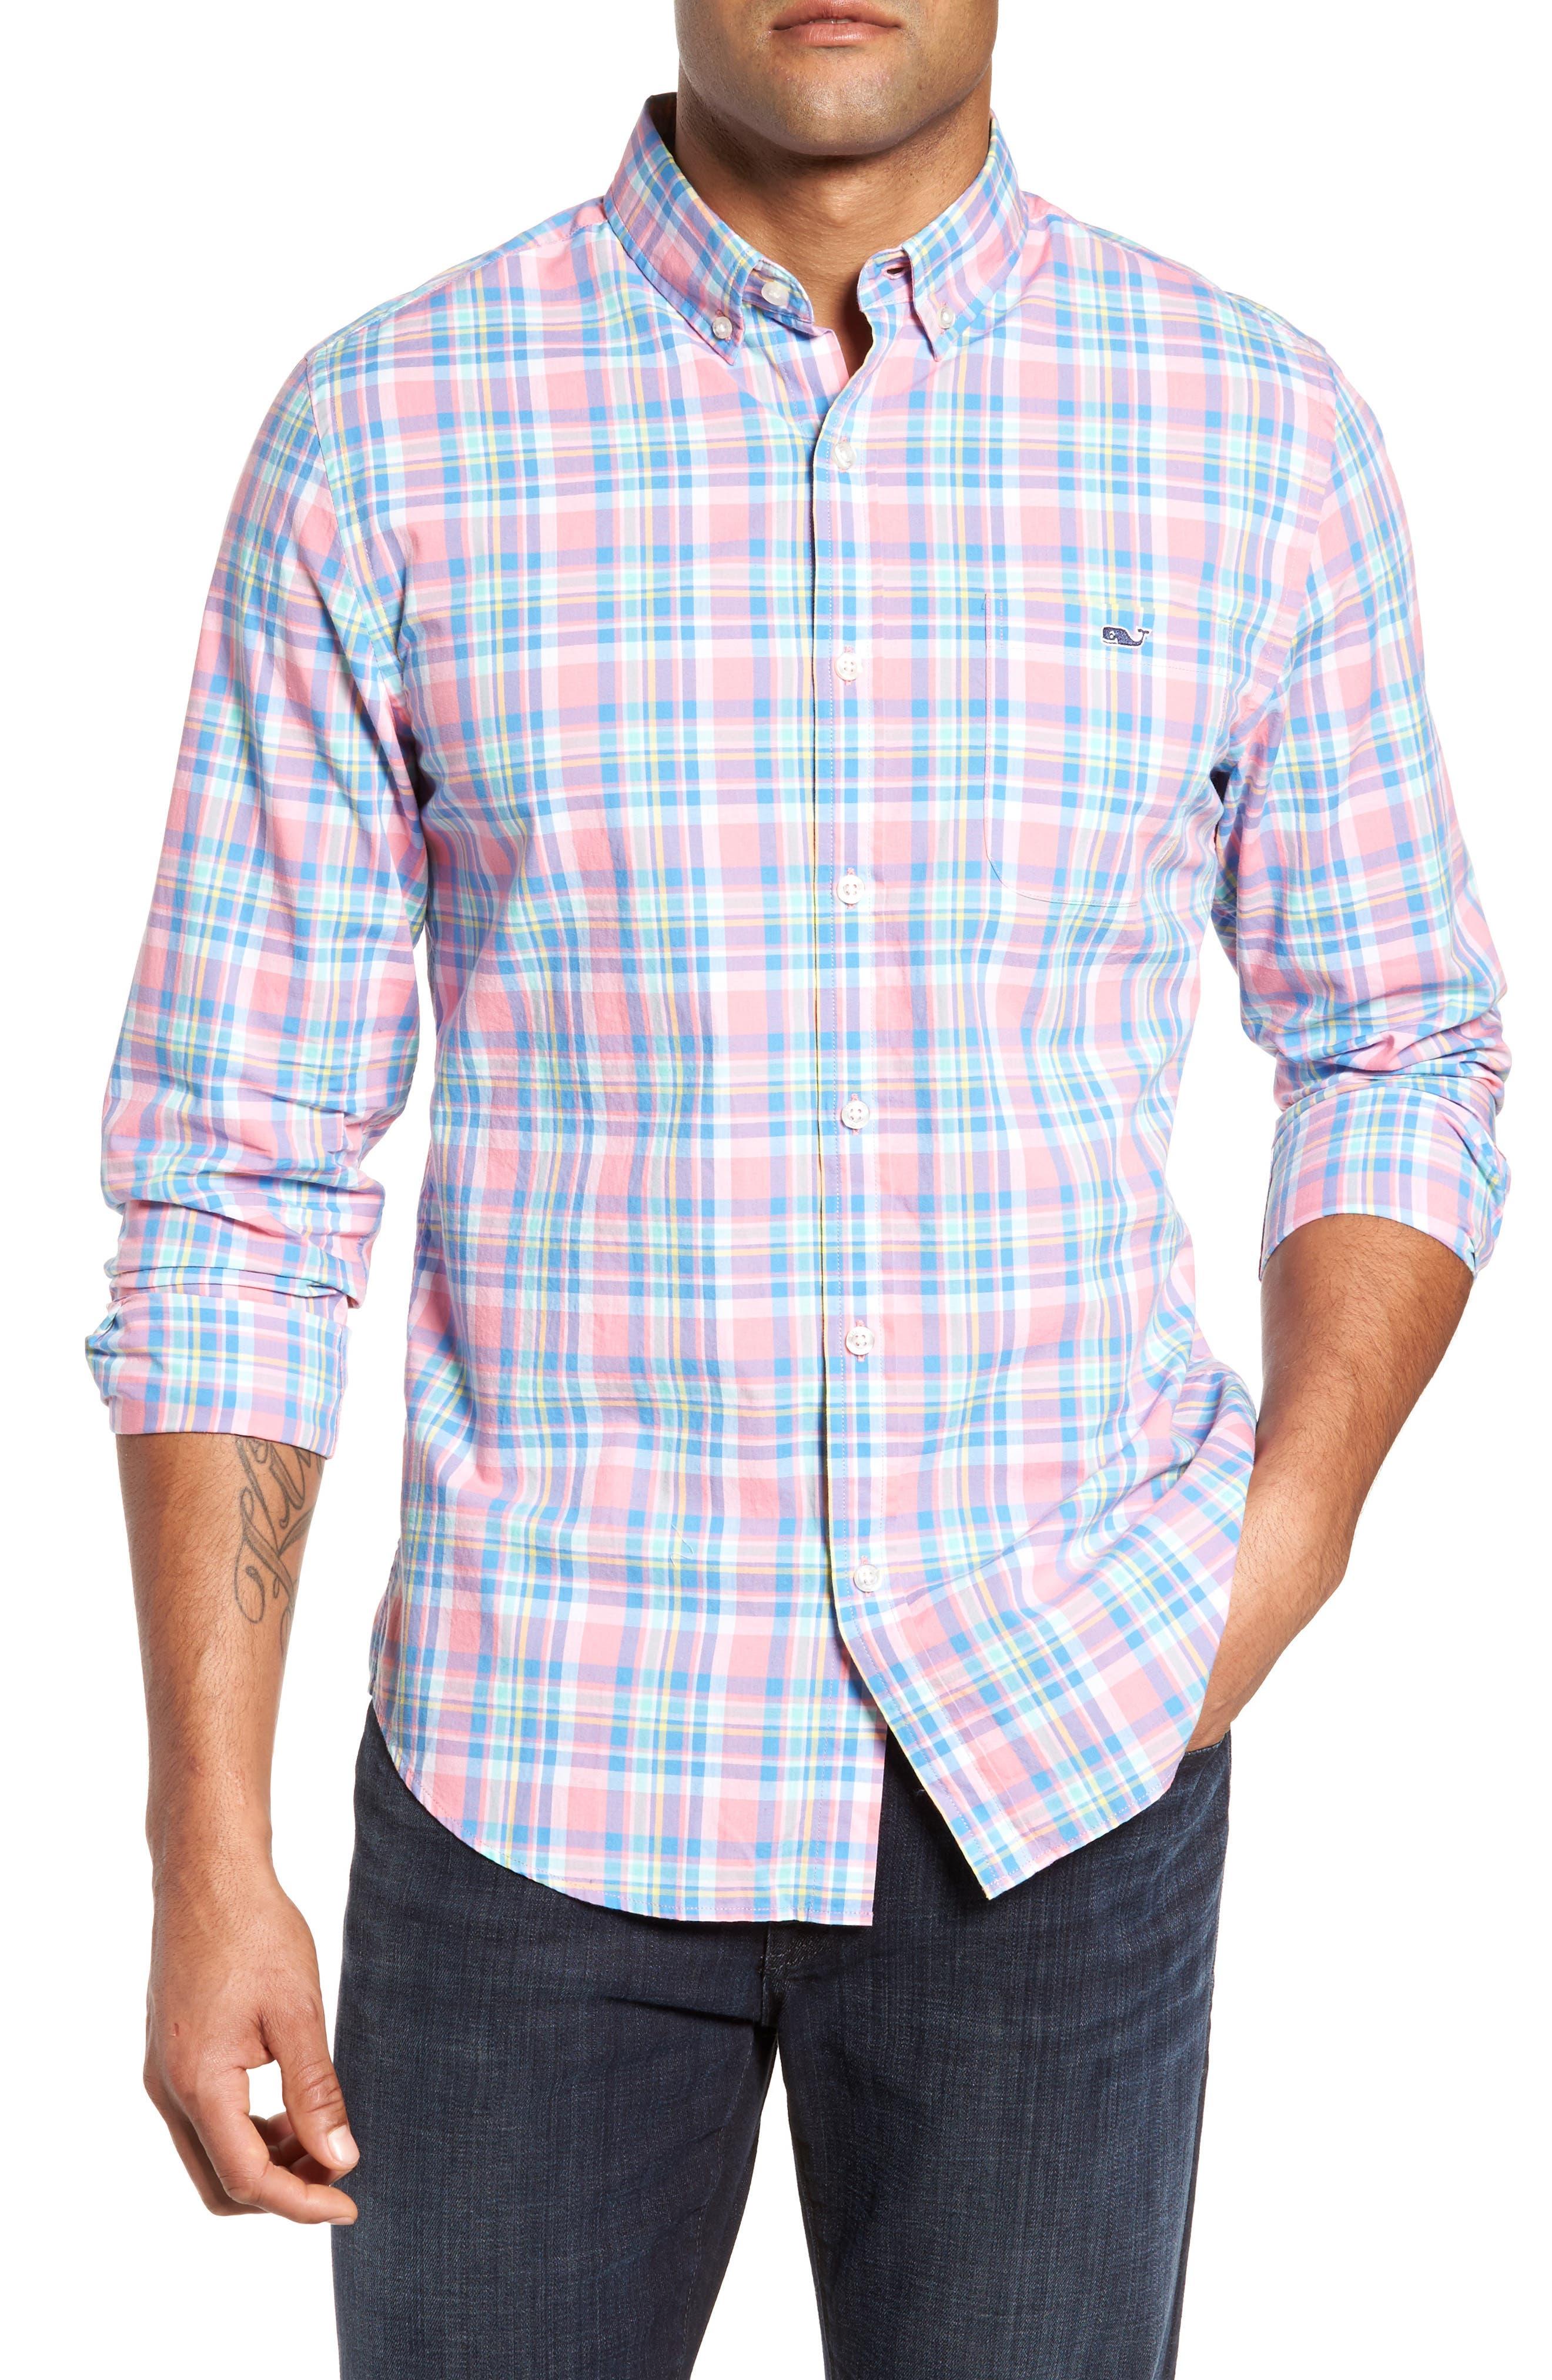 Alternate Image 1 Selected - vineyard vines Cape Haze Tucker Slim Fit Plaid Sport Shirt